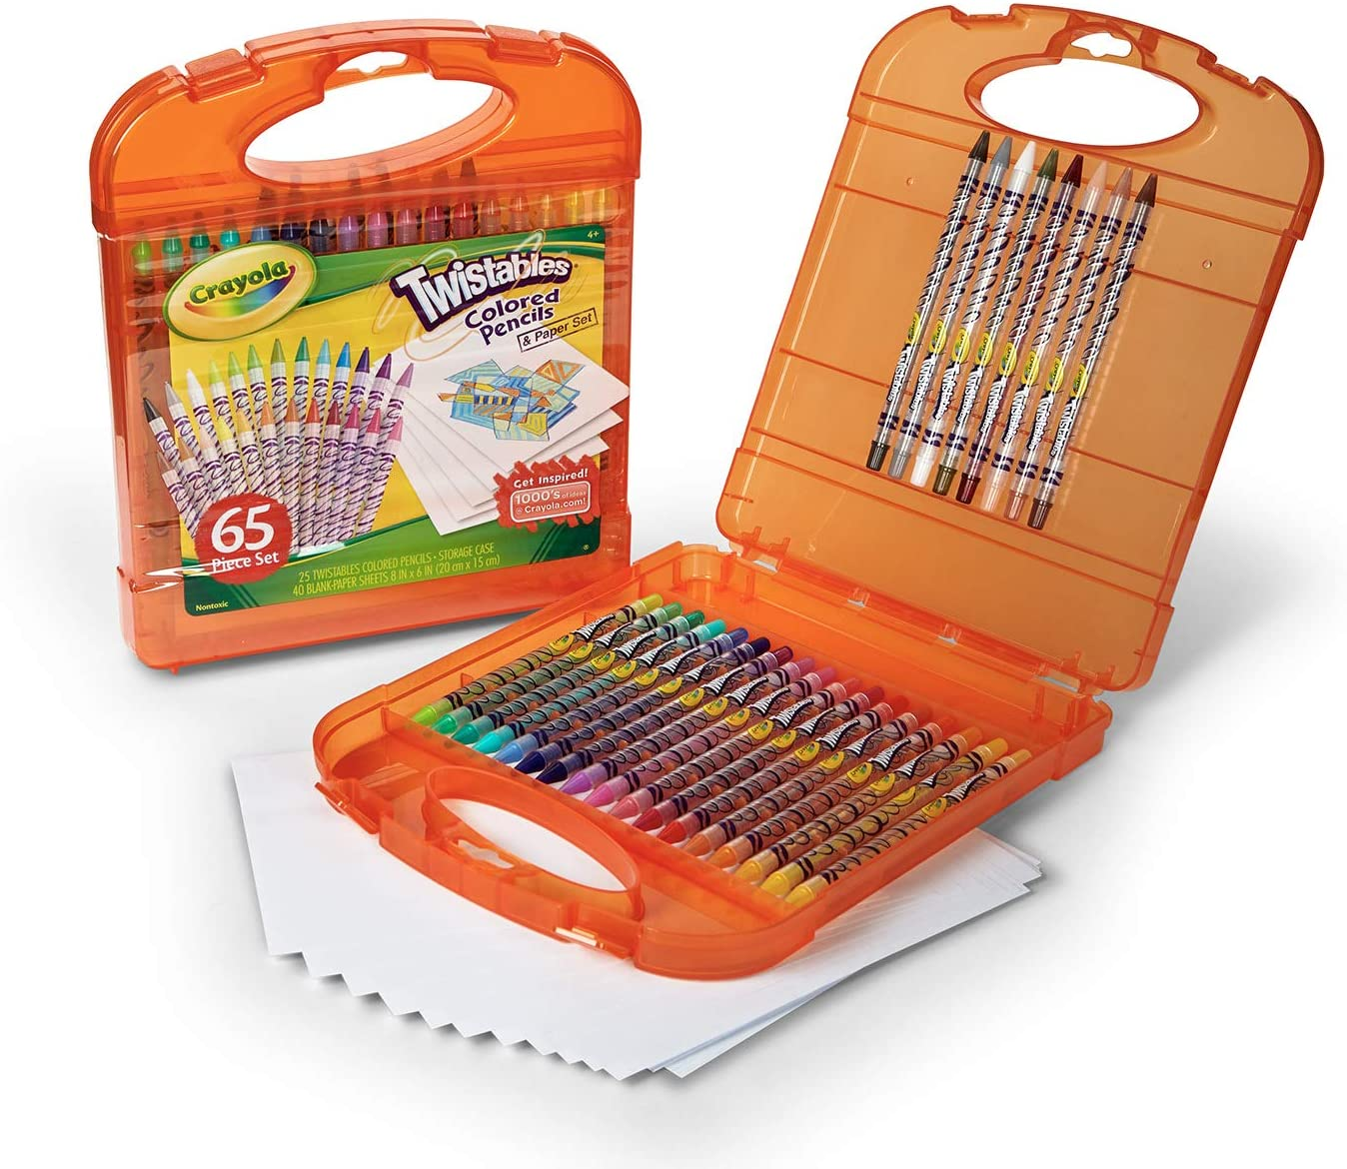 Crayola Twistables Colored Pencils Kit, 25 Twistables Colored Pencils and 40 sheets of paper: Toys & Games